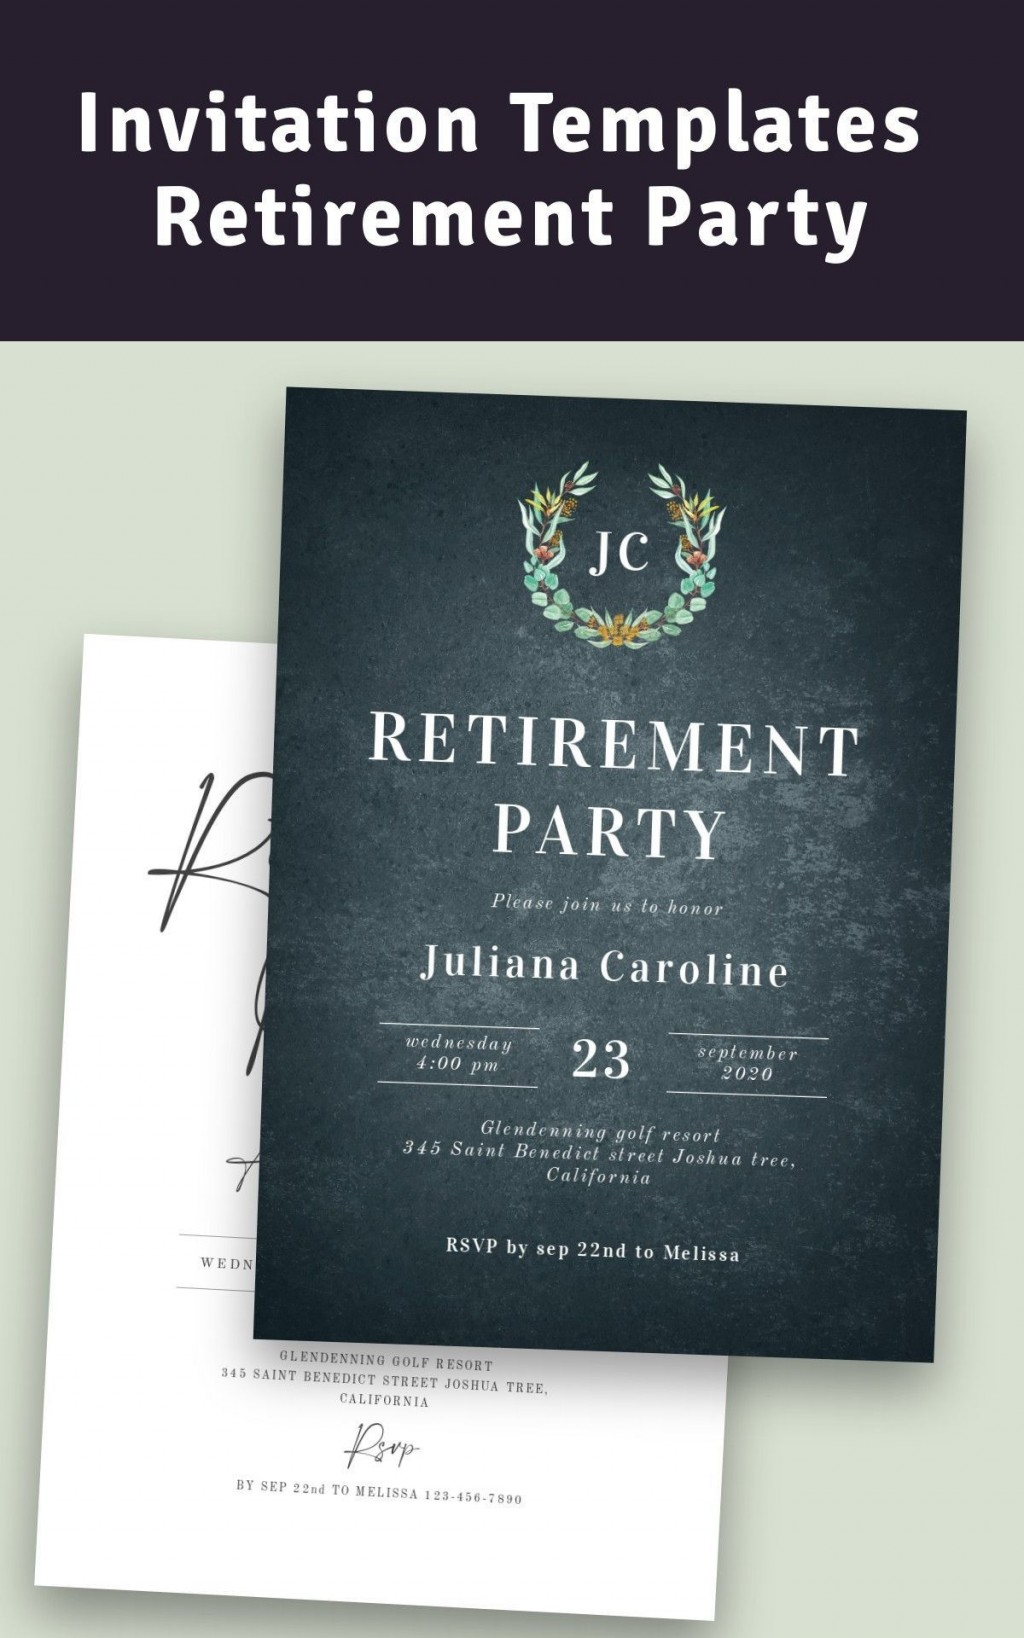 007 Sensational Retirement Party Invitation Template Free Picture  M WordLarge